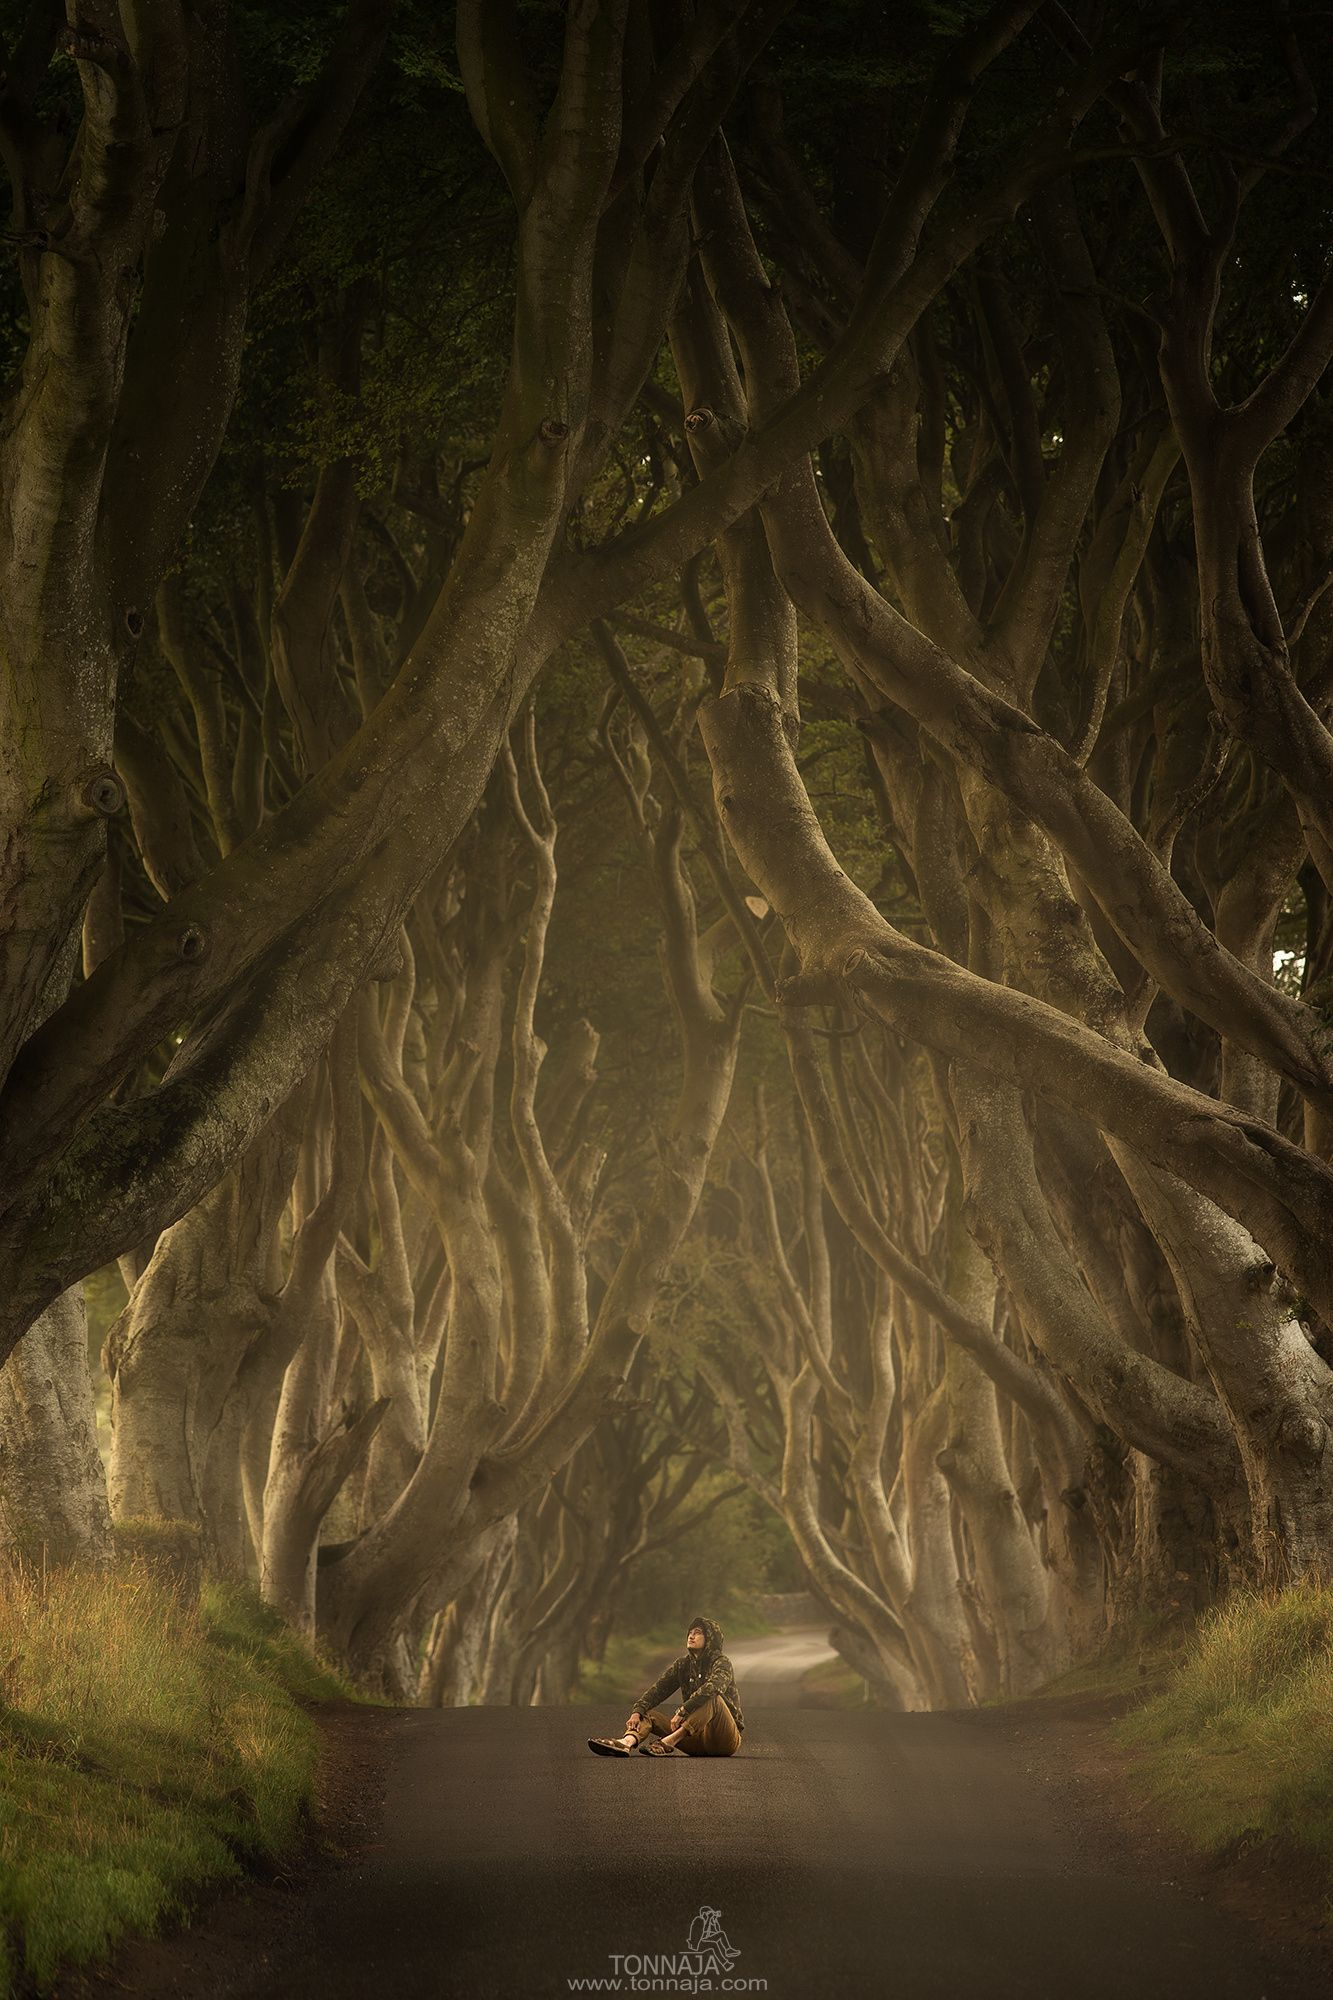 Unter the dark hedges by Tonnaja Anan Charoenkal on 500px